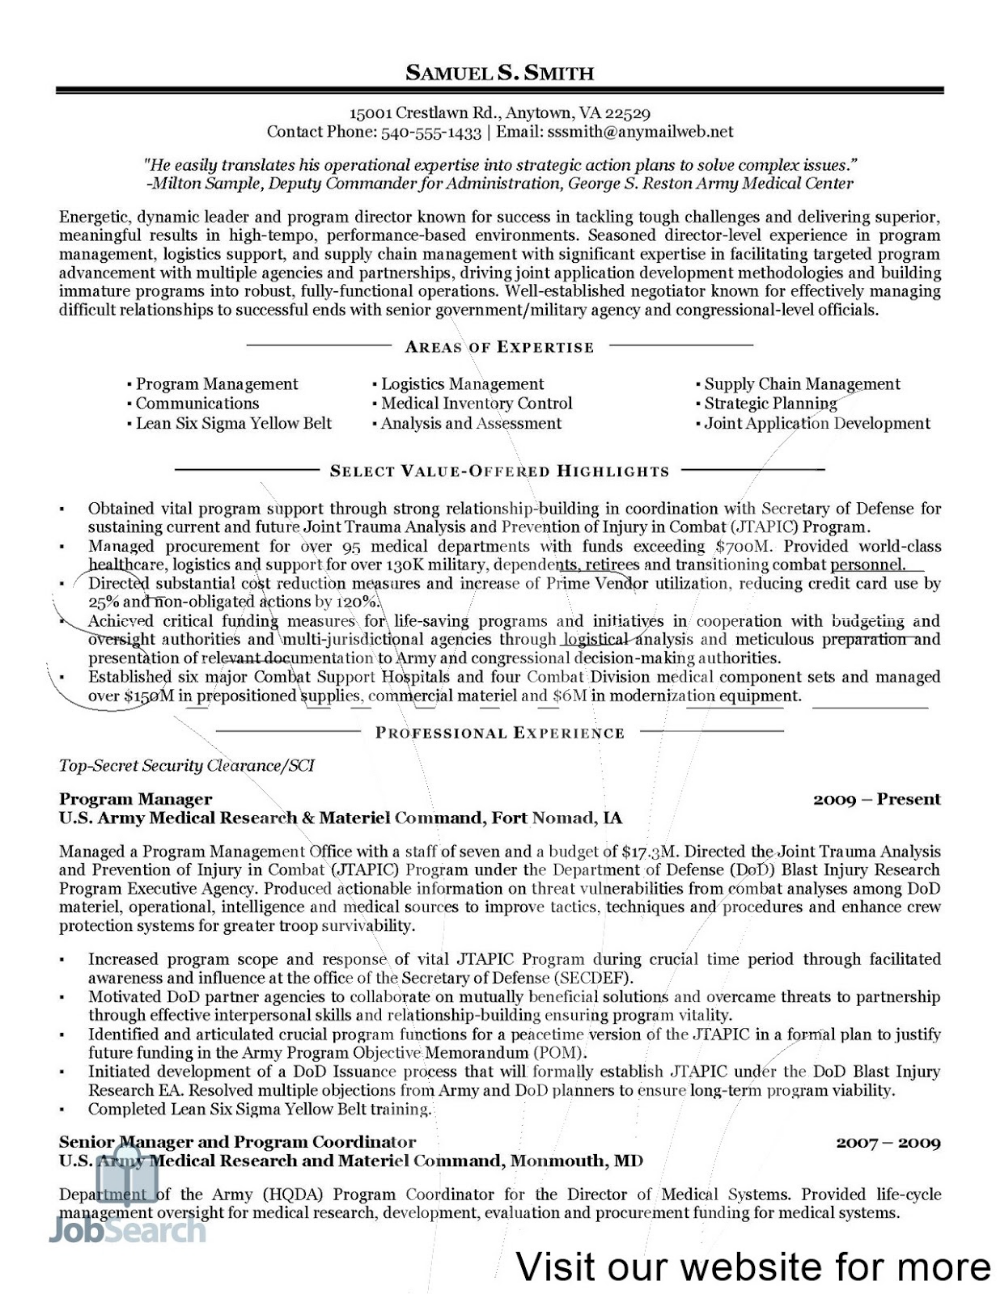 Medical Transcription Sample Resume Format UK in 2020